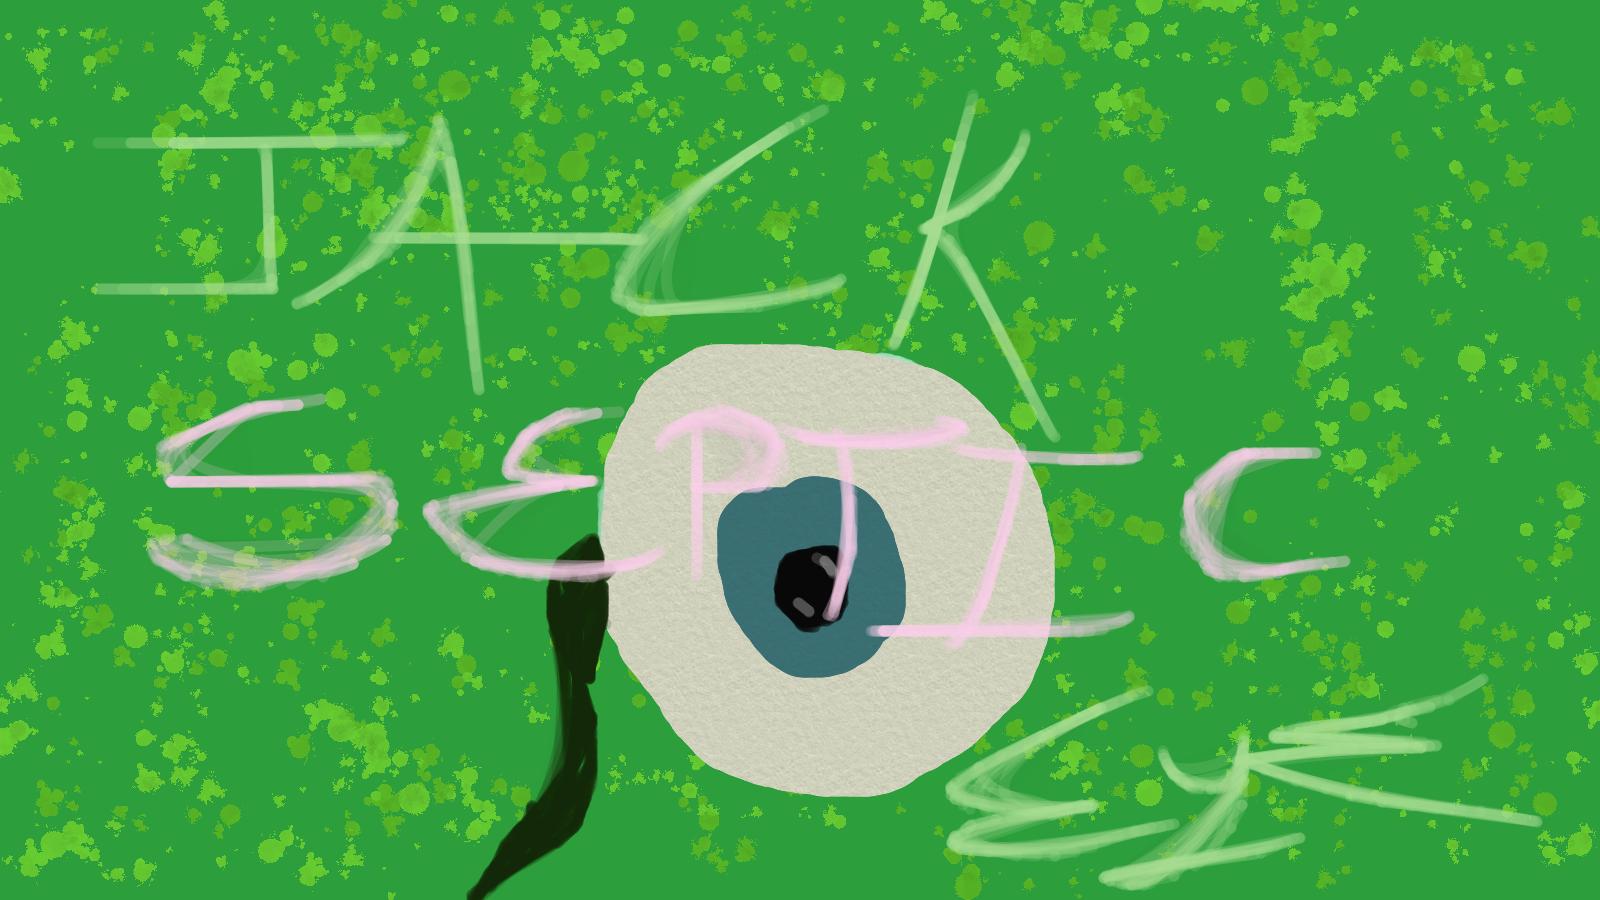 jack septic eye by goodoleddyteach fan art wallpaper other 2013 2014 1600x900